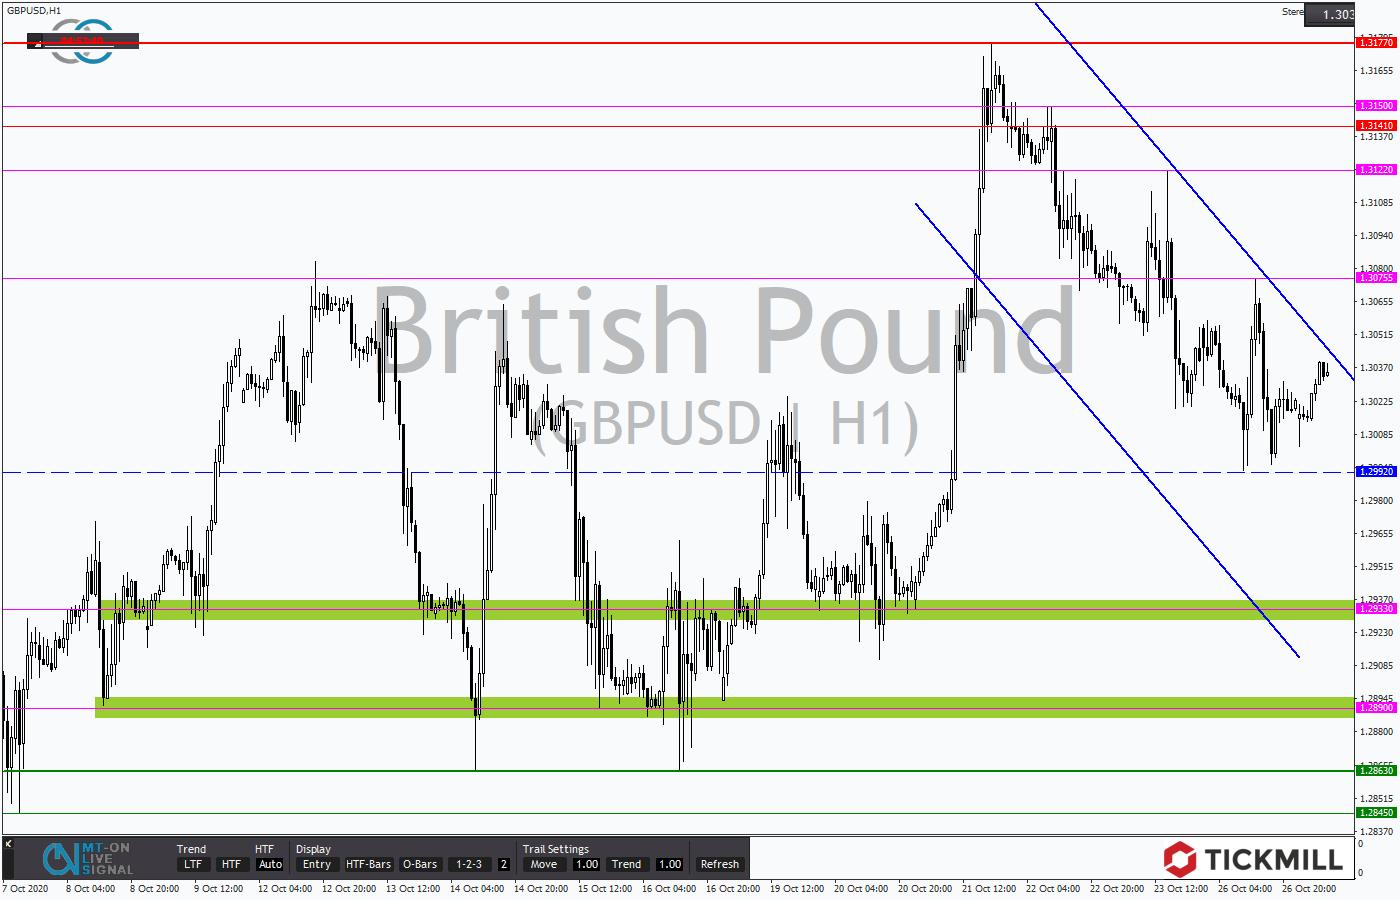 Tickmill-Analyse: GBPUSD im Stundenchart